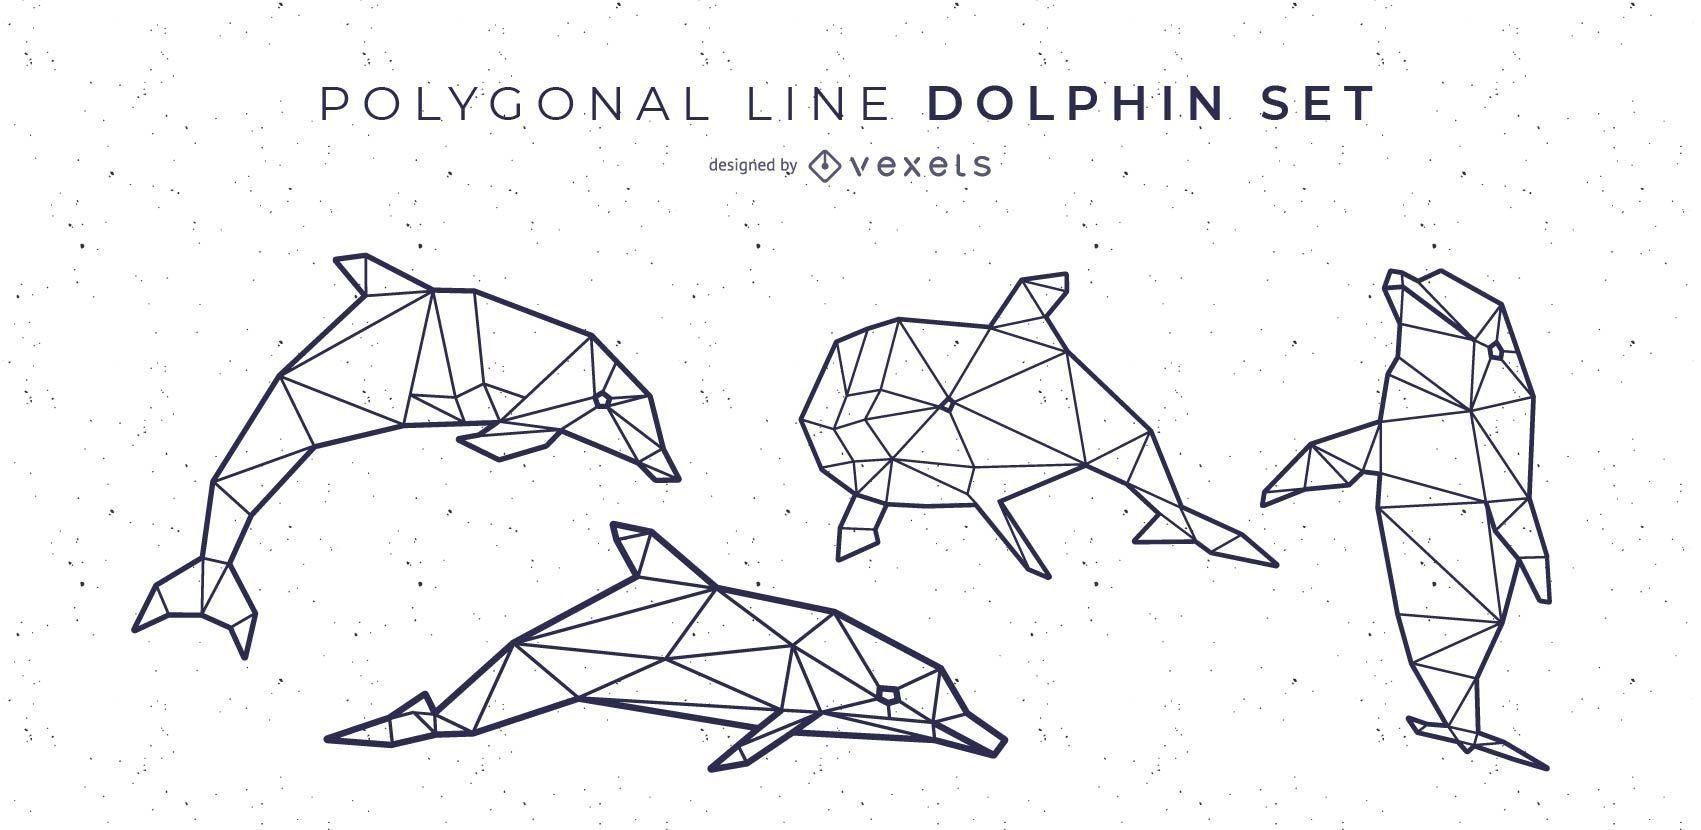 Dise?o de delfines de l?nea poligonal